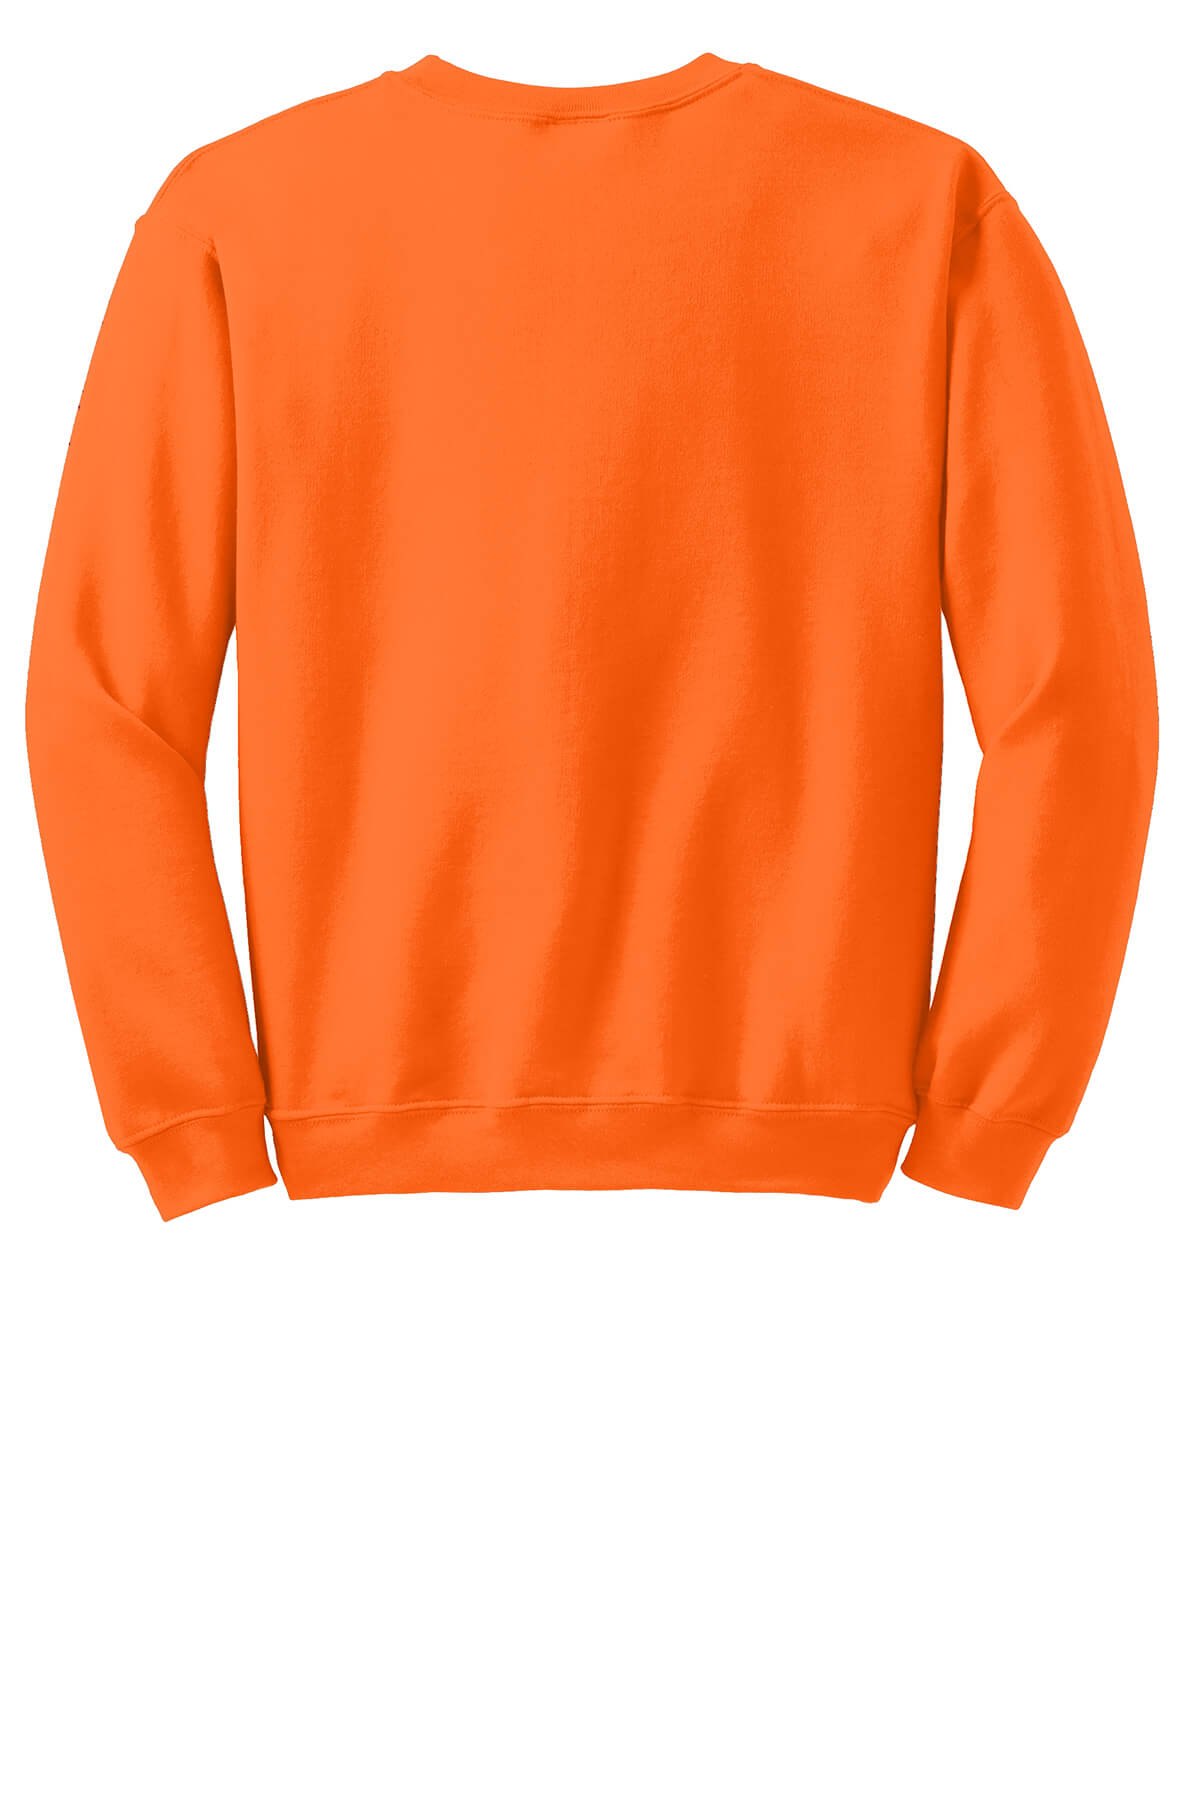 18000-southern-orange-6